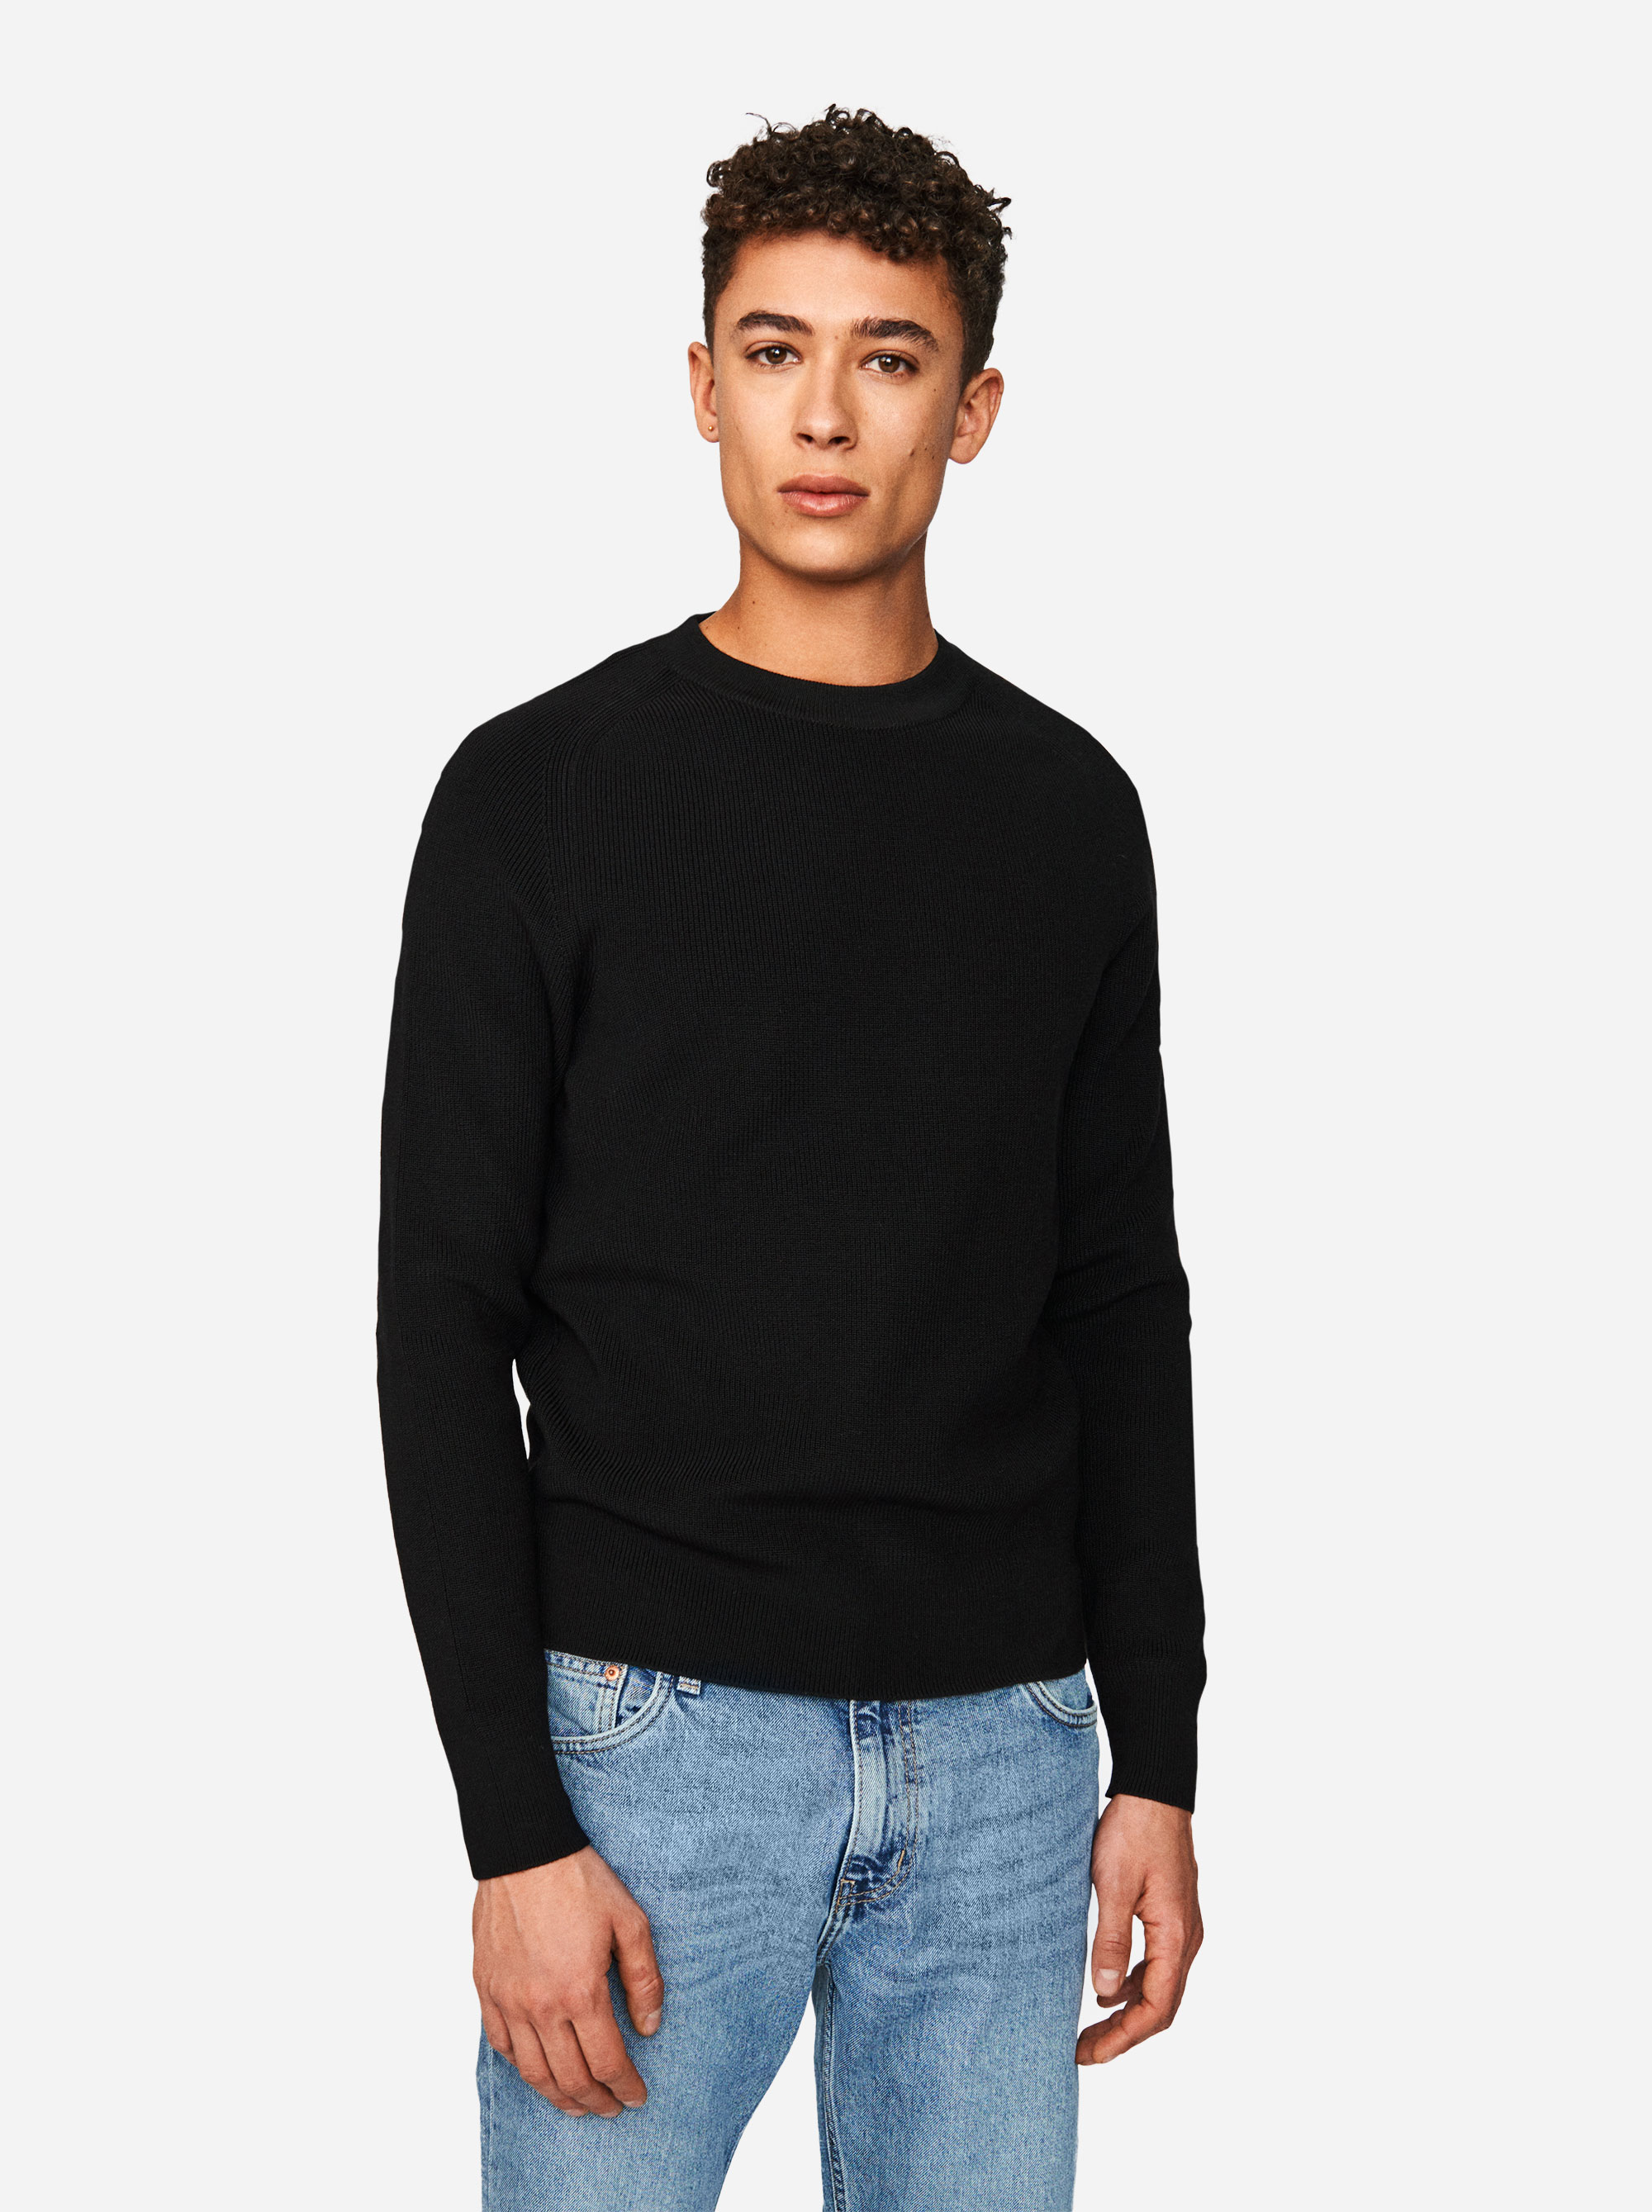 Teym - The Merino Sweater - Men - Black - 3